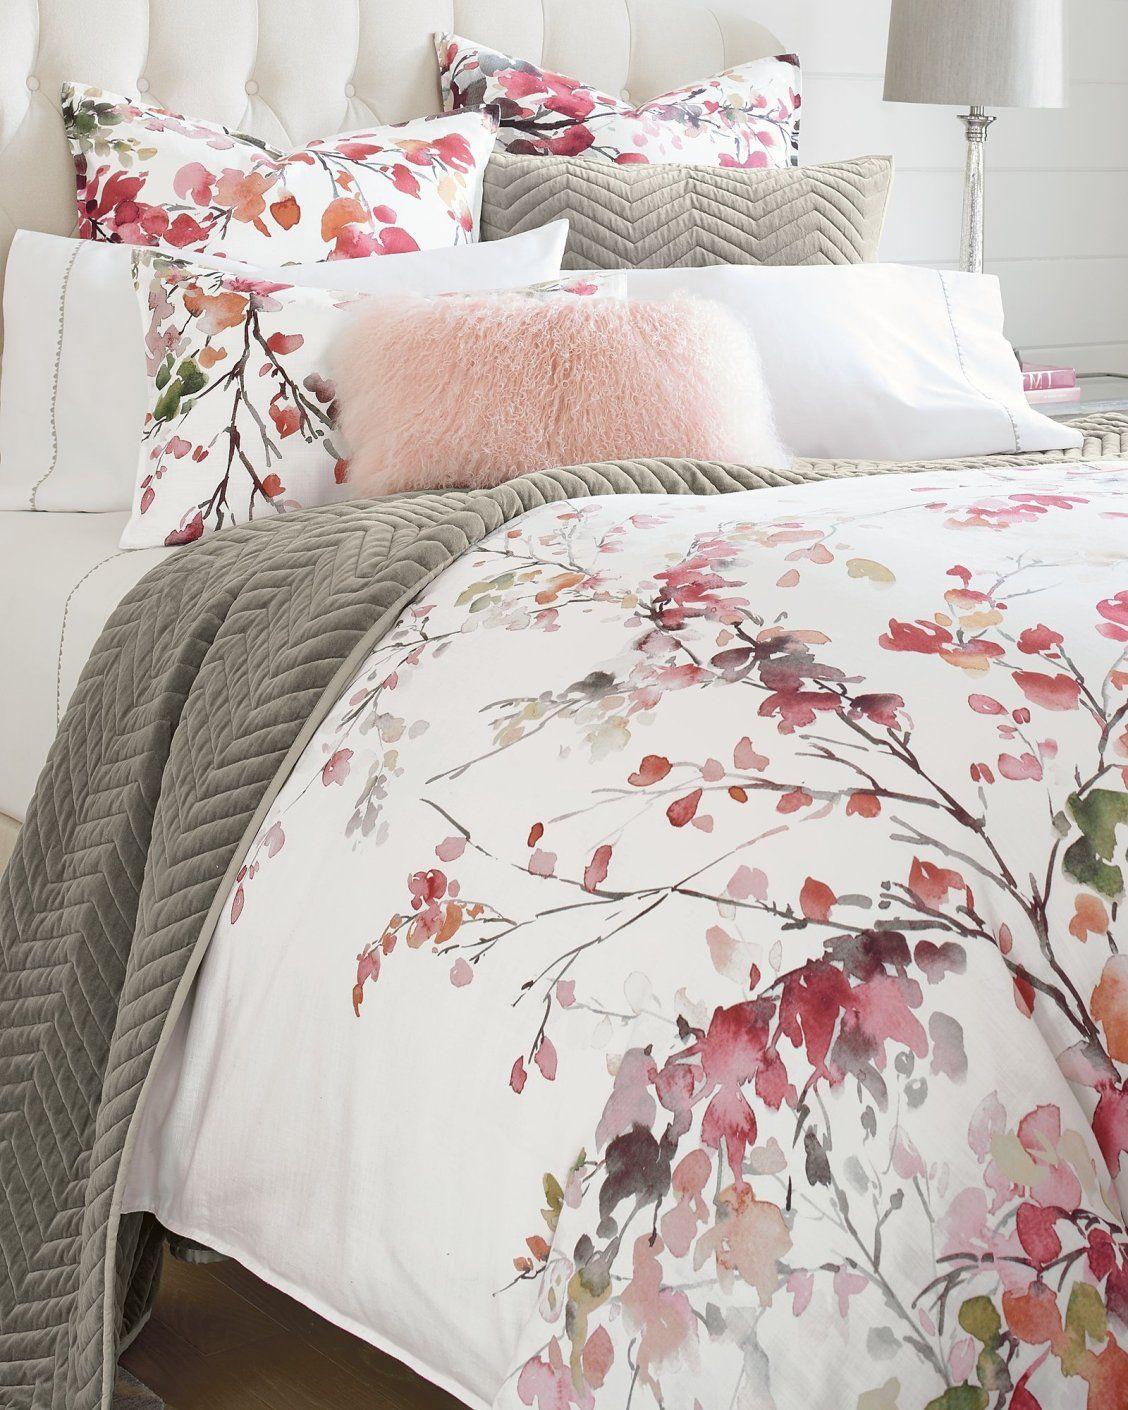 Autumn Blossom Duvet Cover And Shams Luxury Bedding Bedding